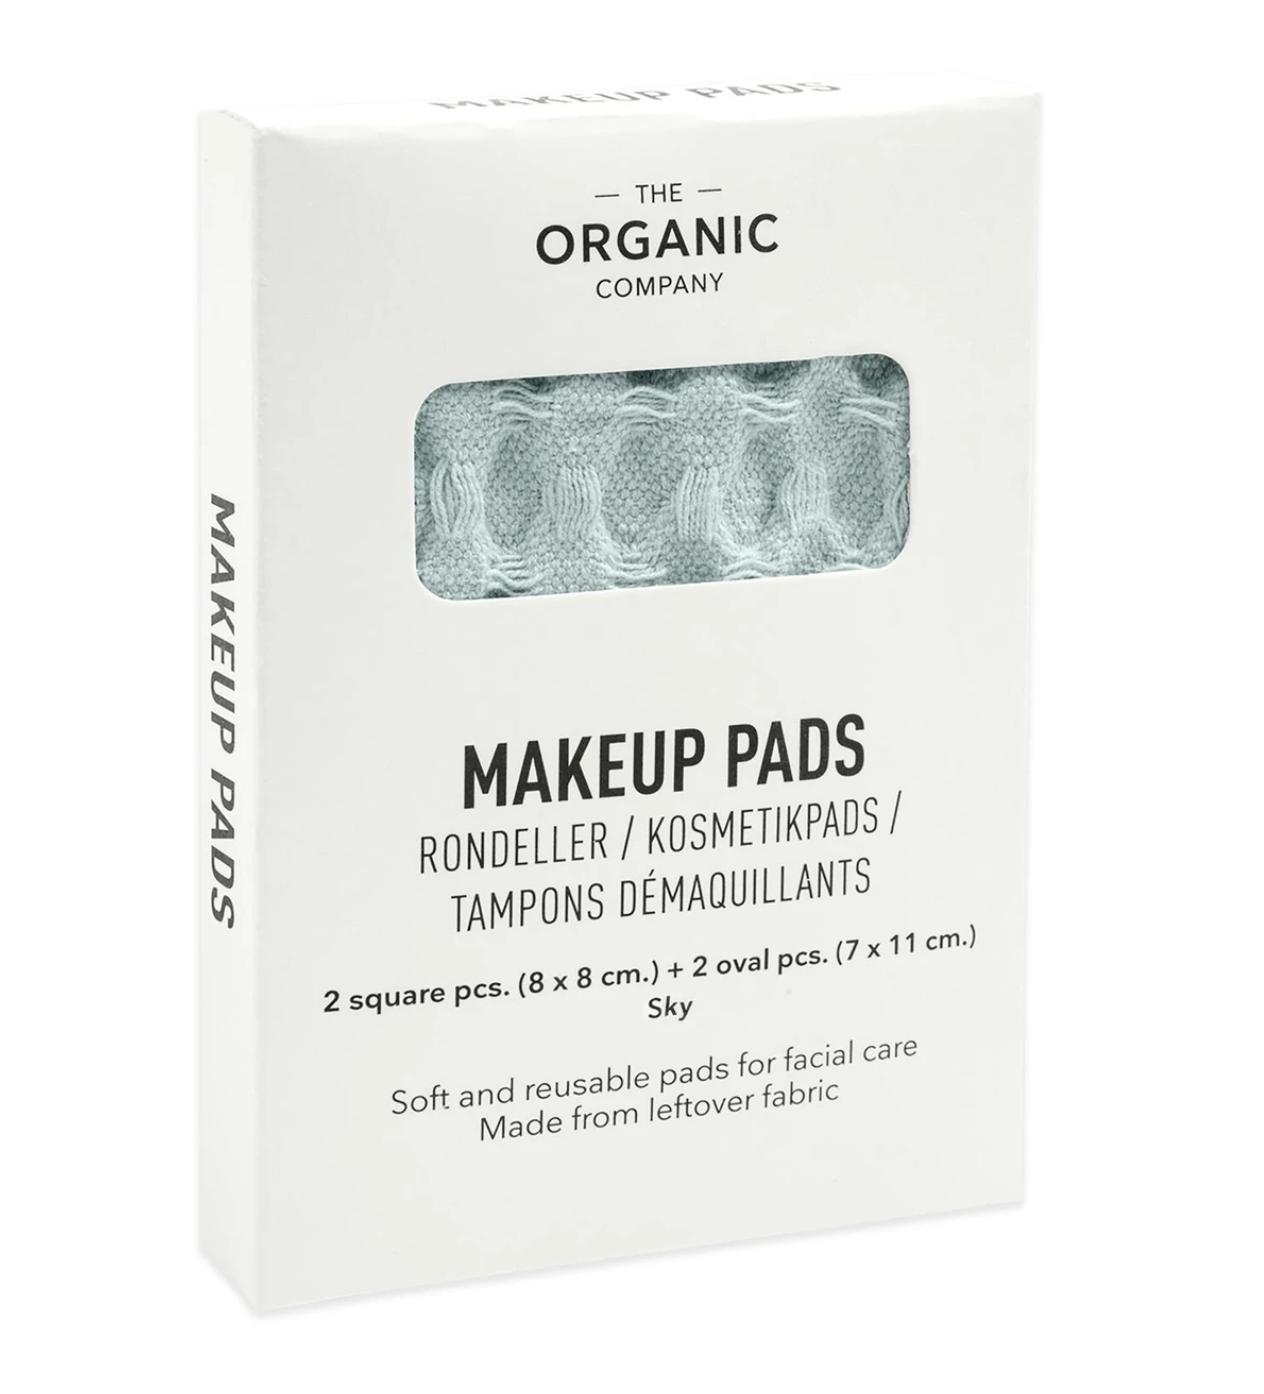 Make-up Pads Hemelblauw - The Organic Company-3